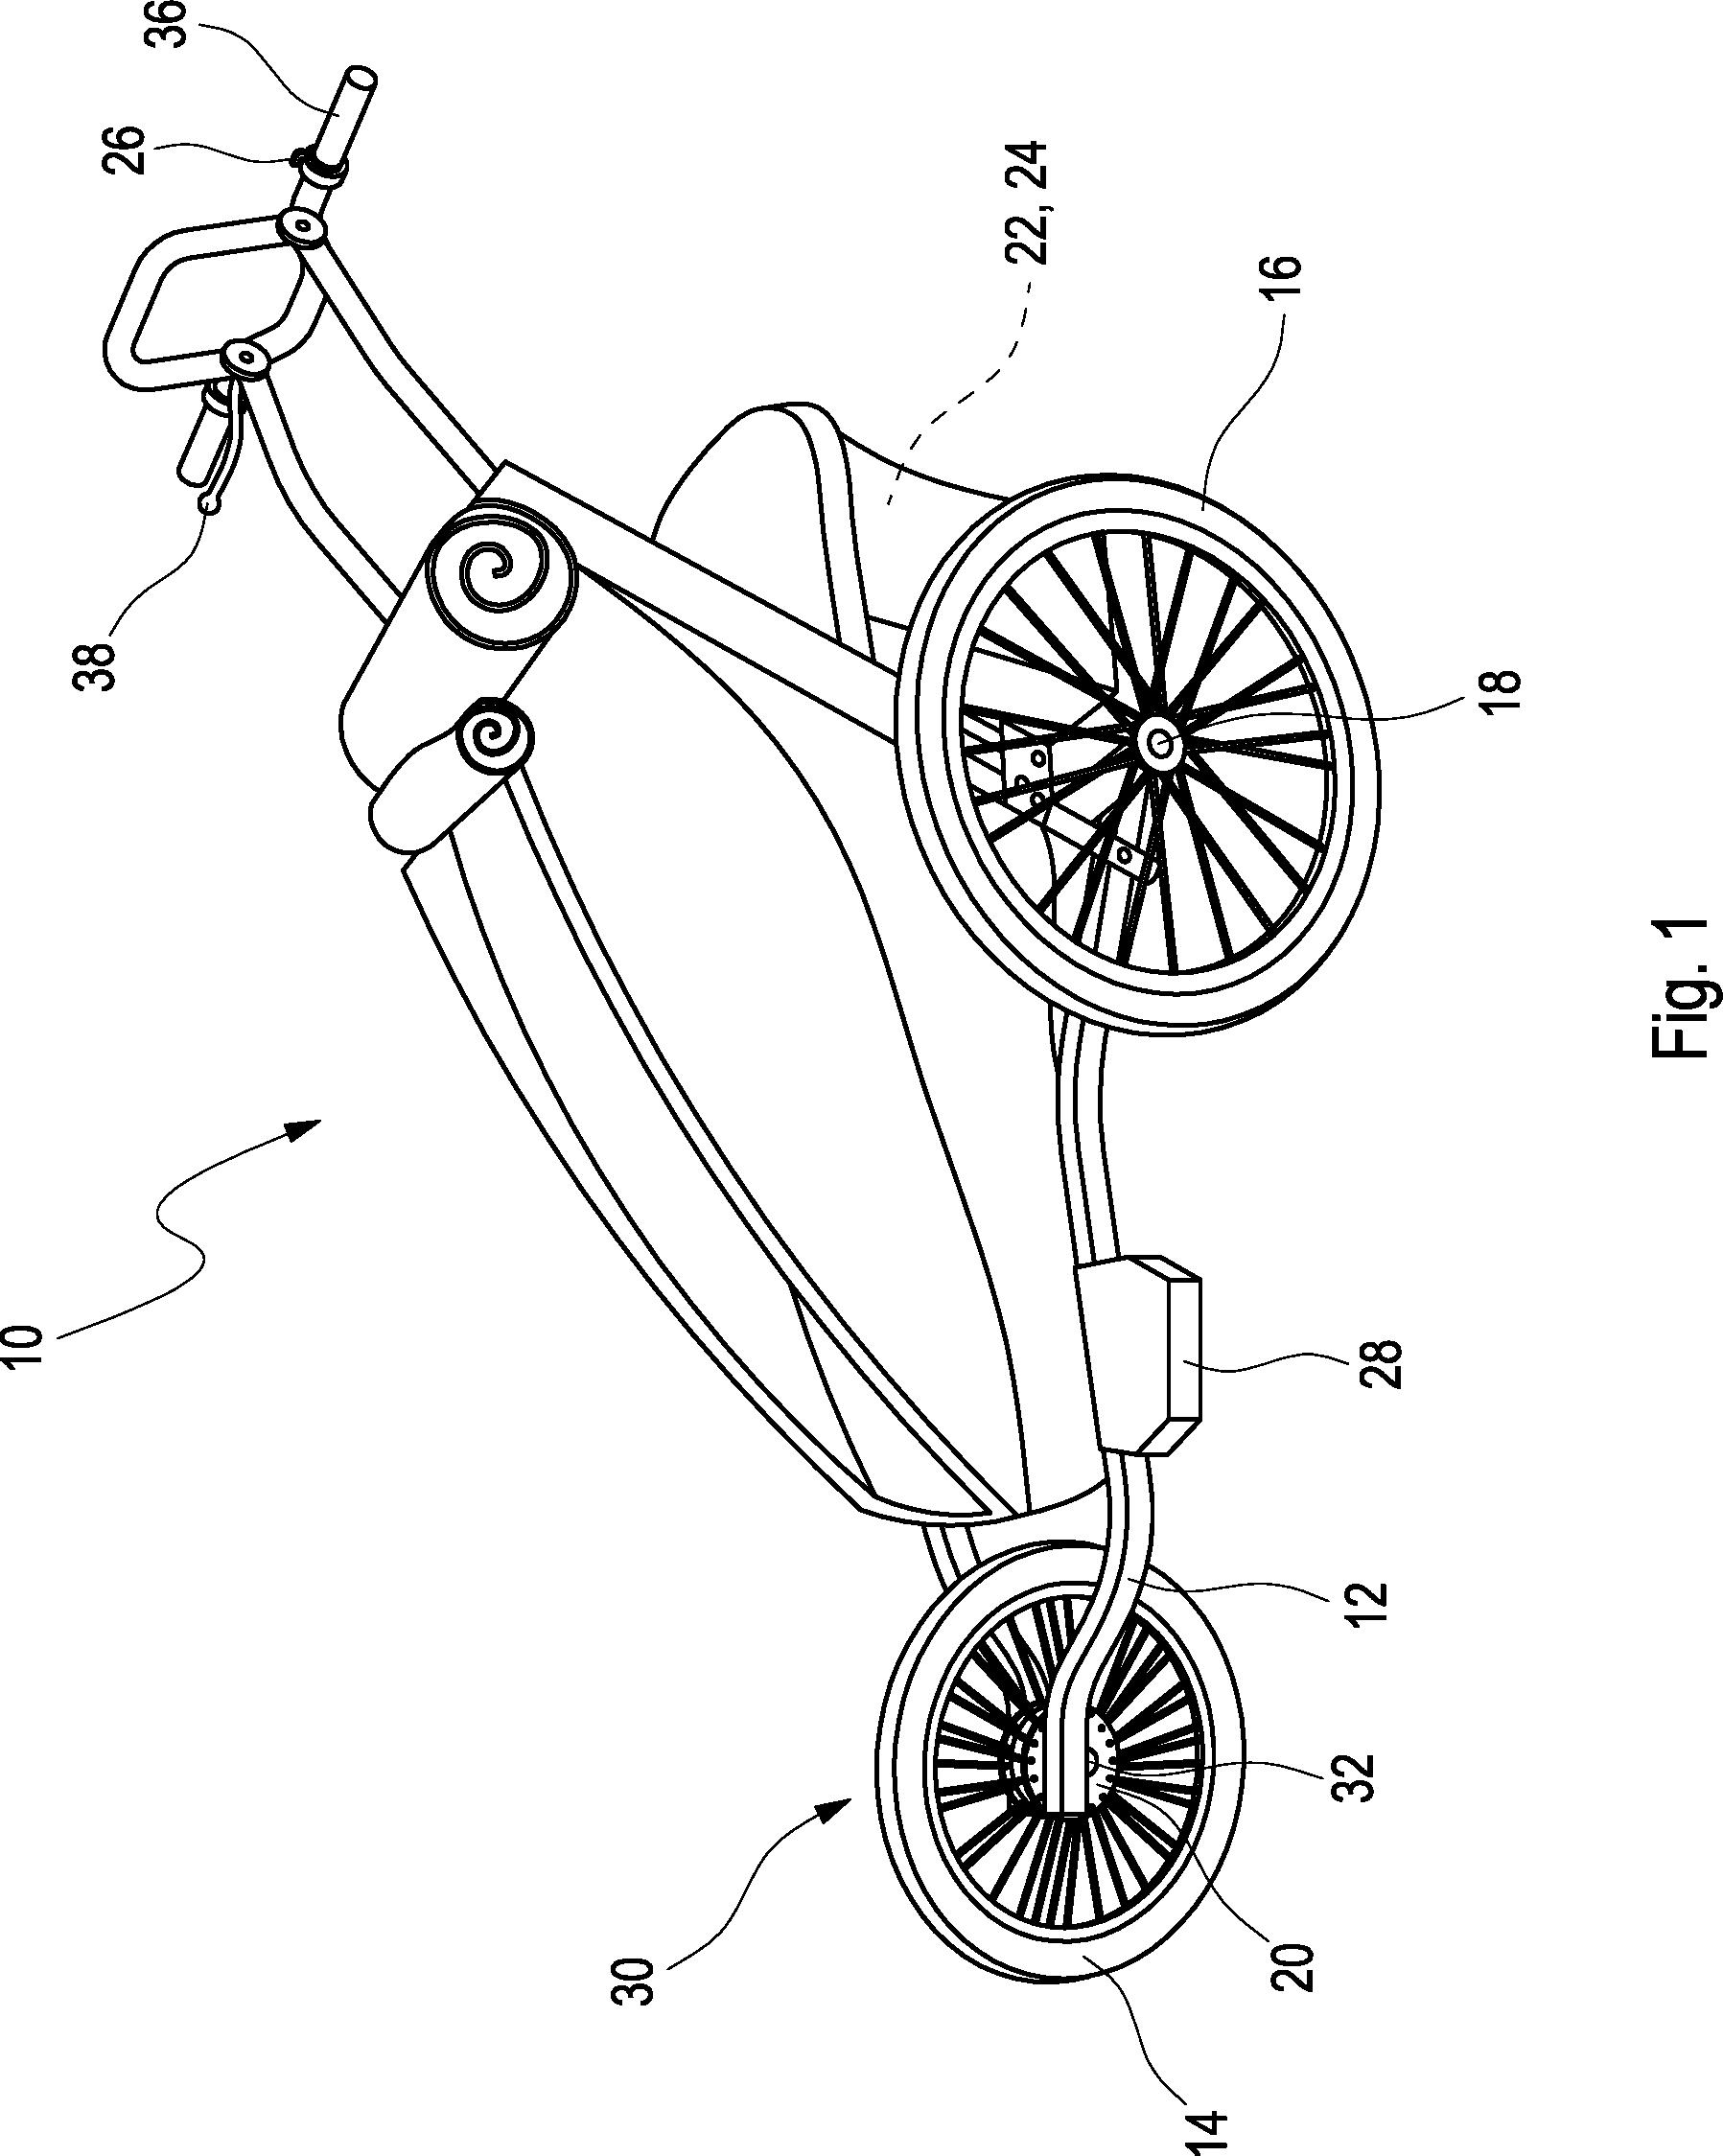 patent de102012100435a1 handgef hrtes fahrzeug google. Black Bedroom Furniture Sets. Home Design Ideas